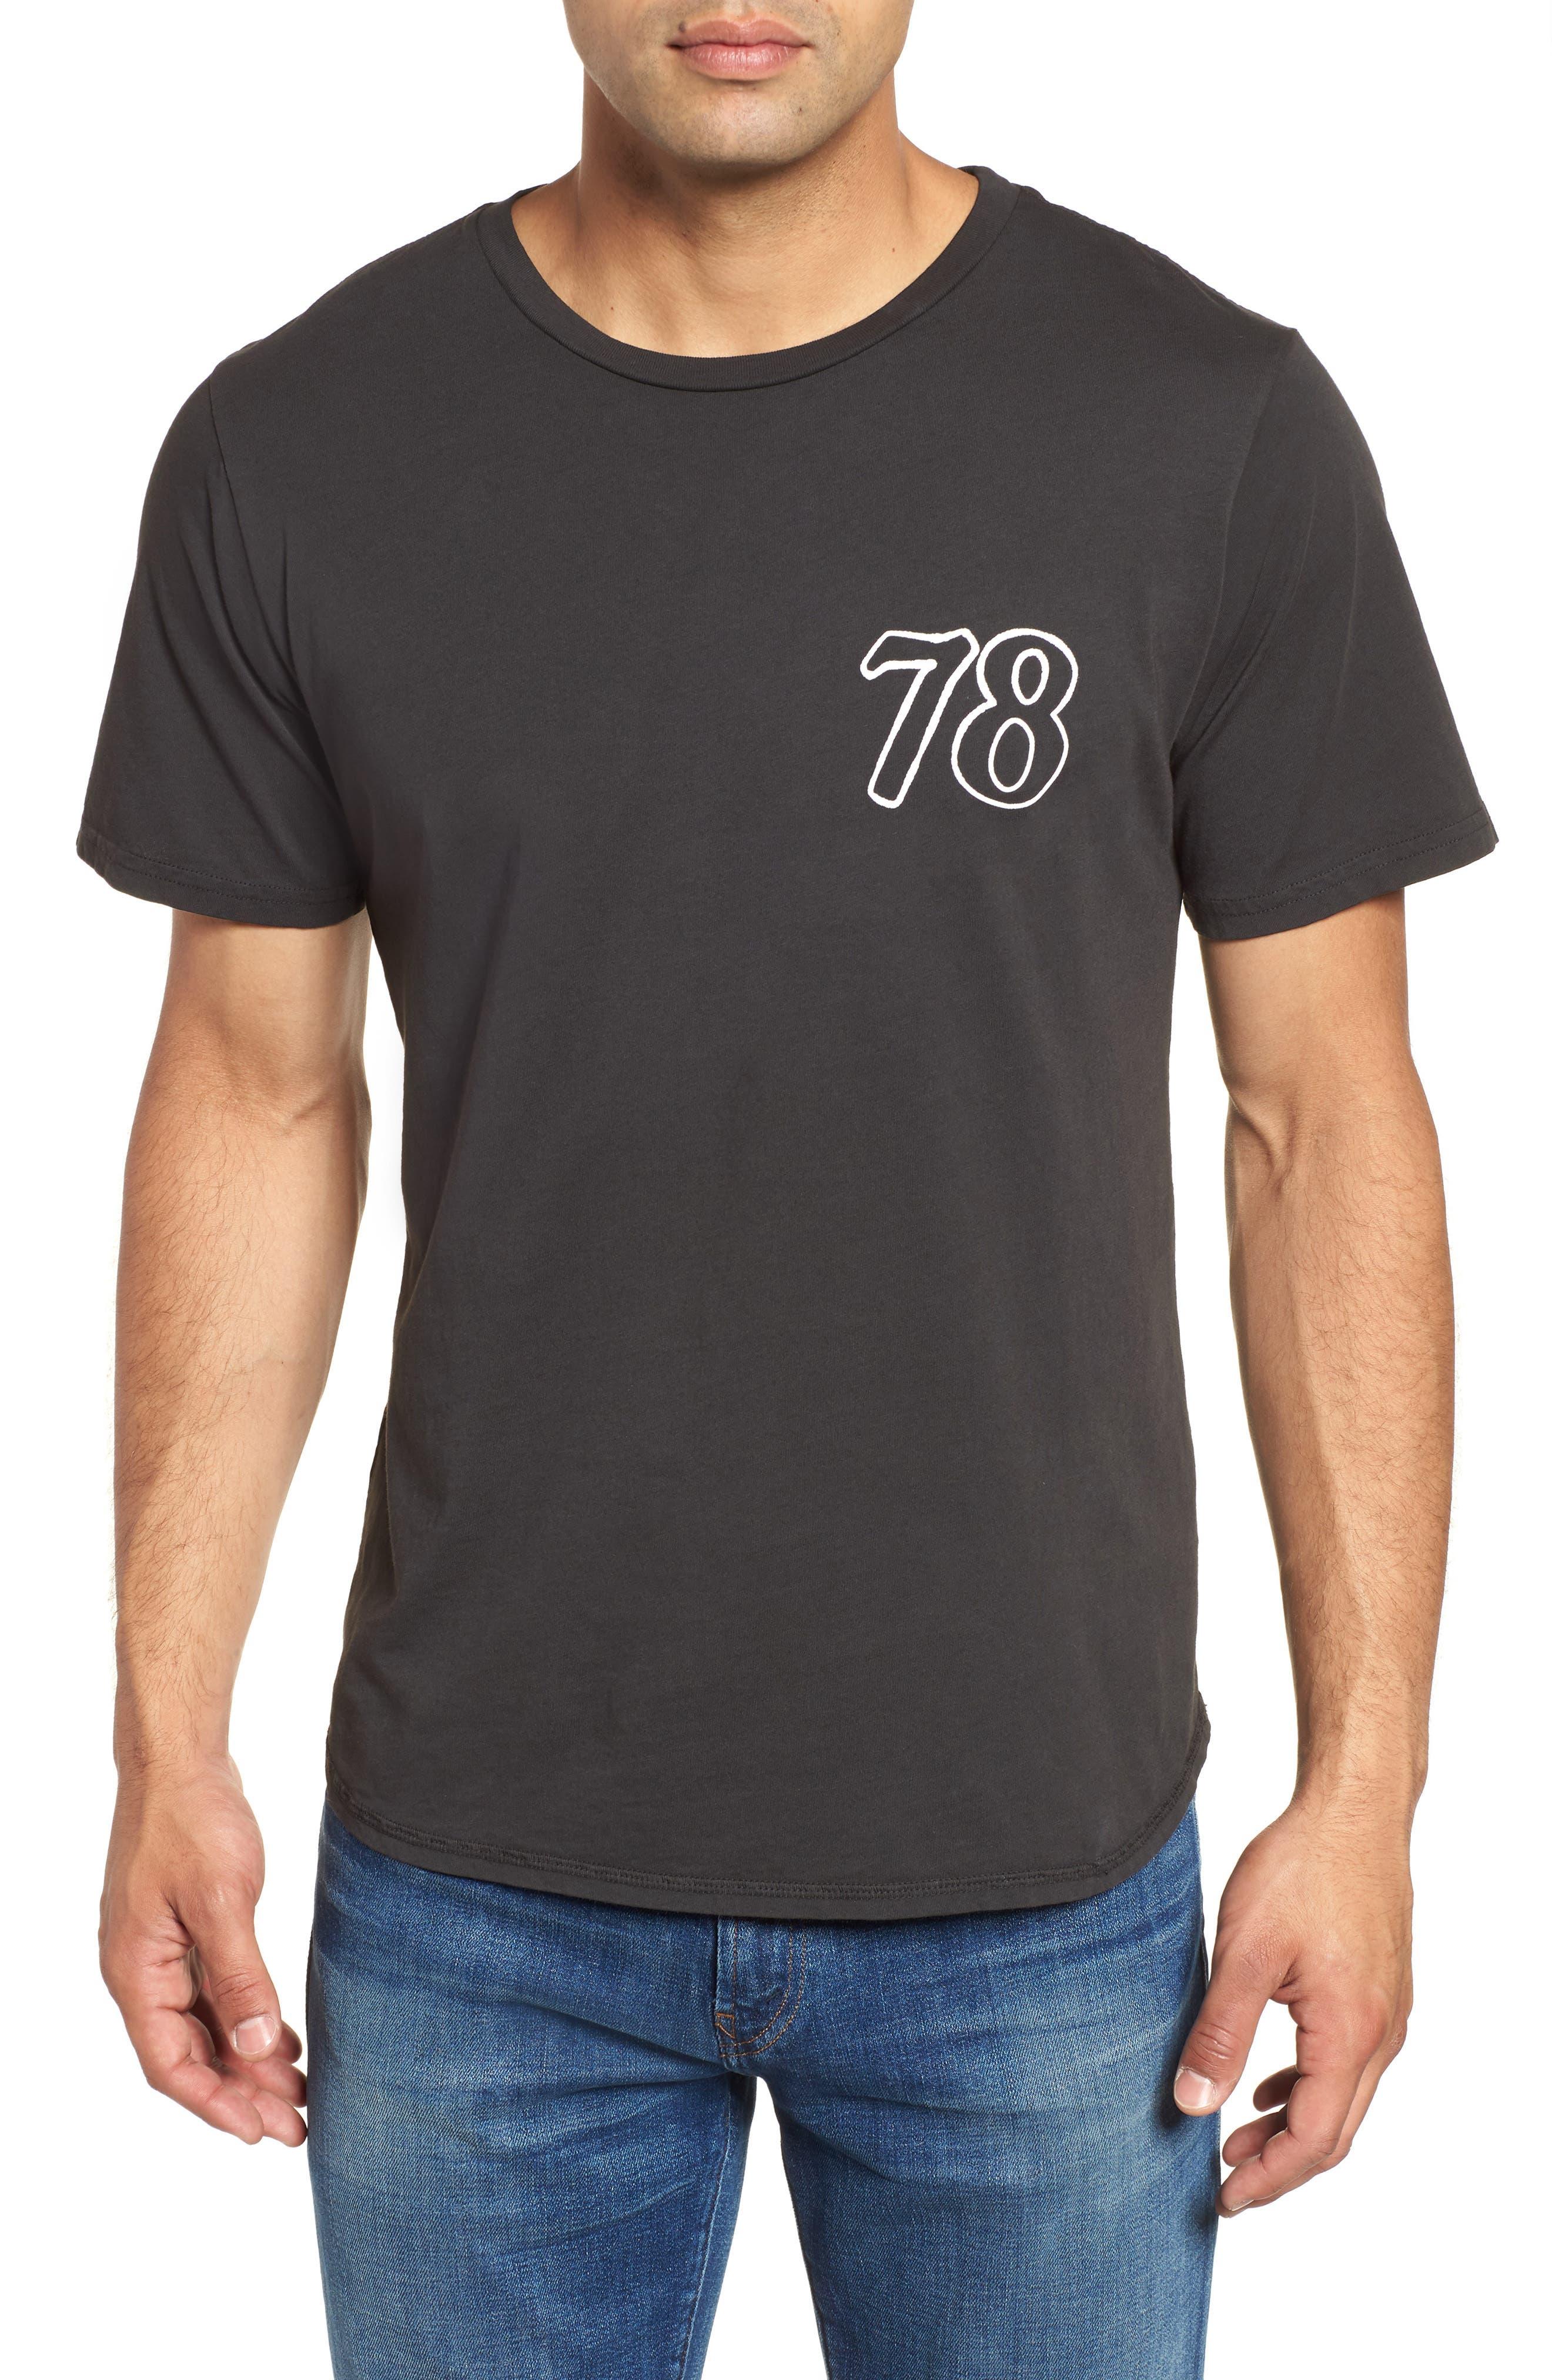 Only the Good Crewneck T-Shirt,                             Main thumbnail 1, color,                             Dusty Black